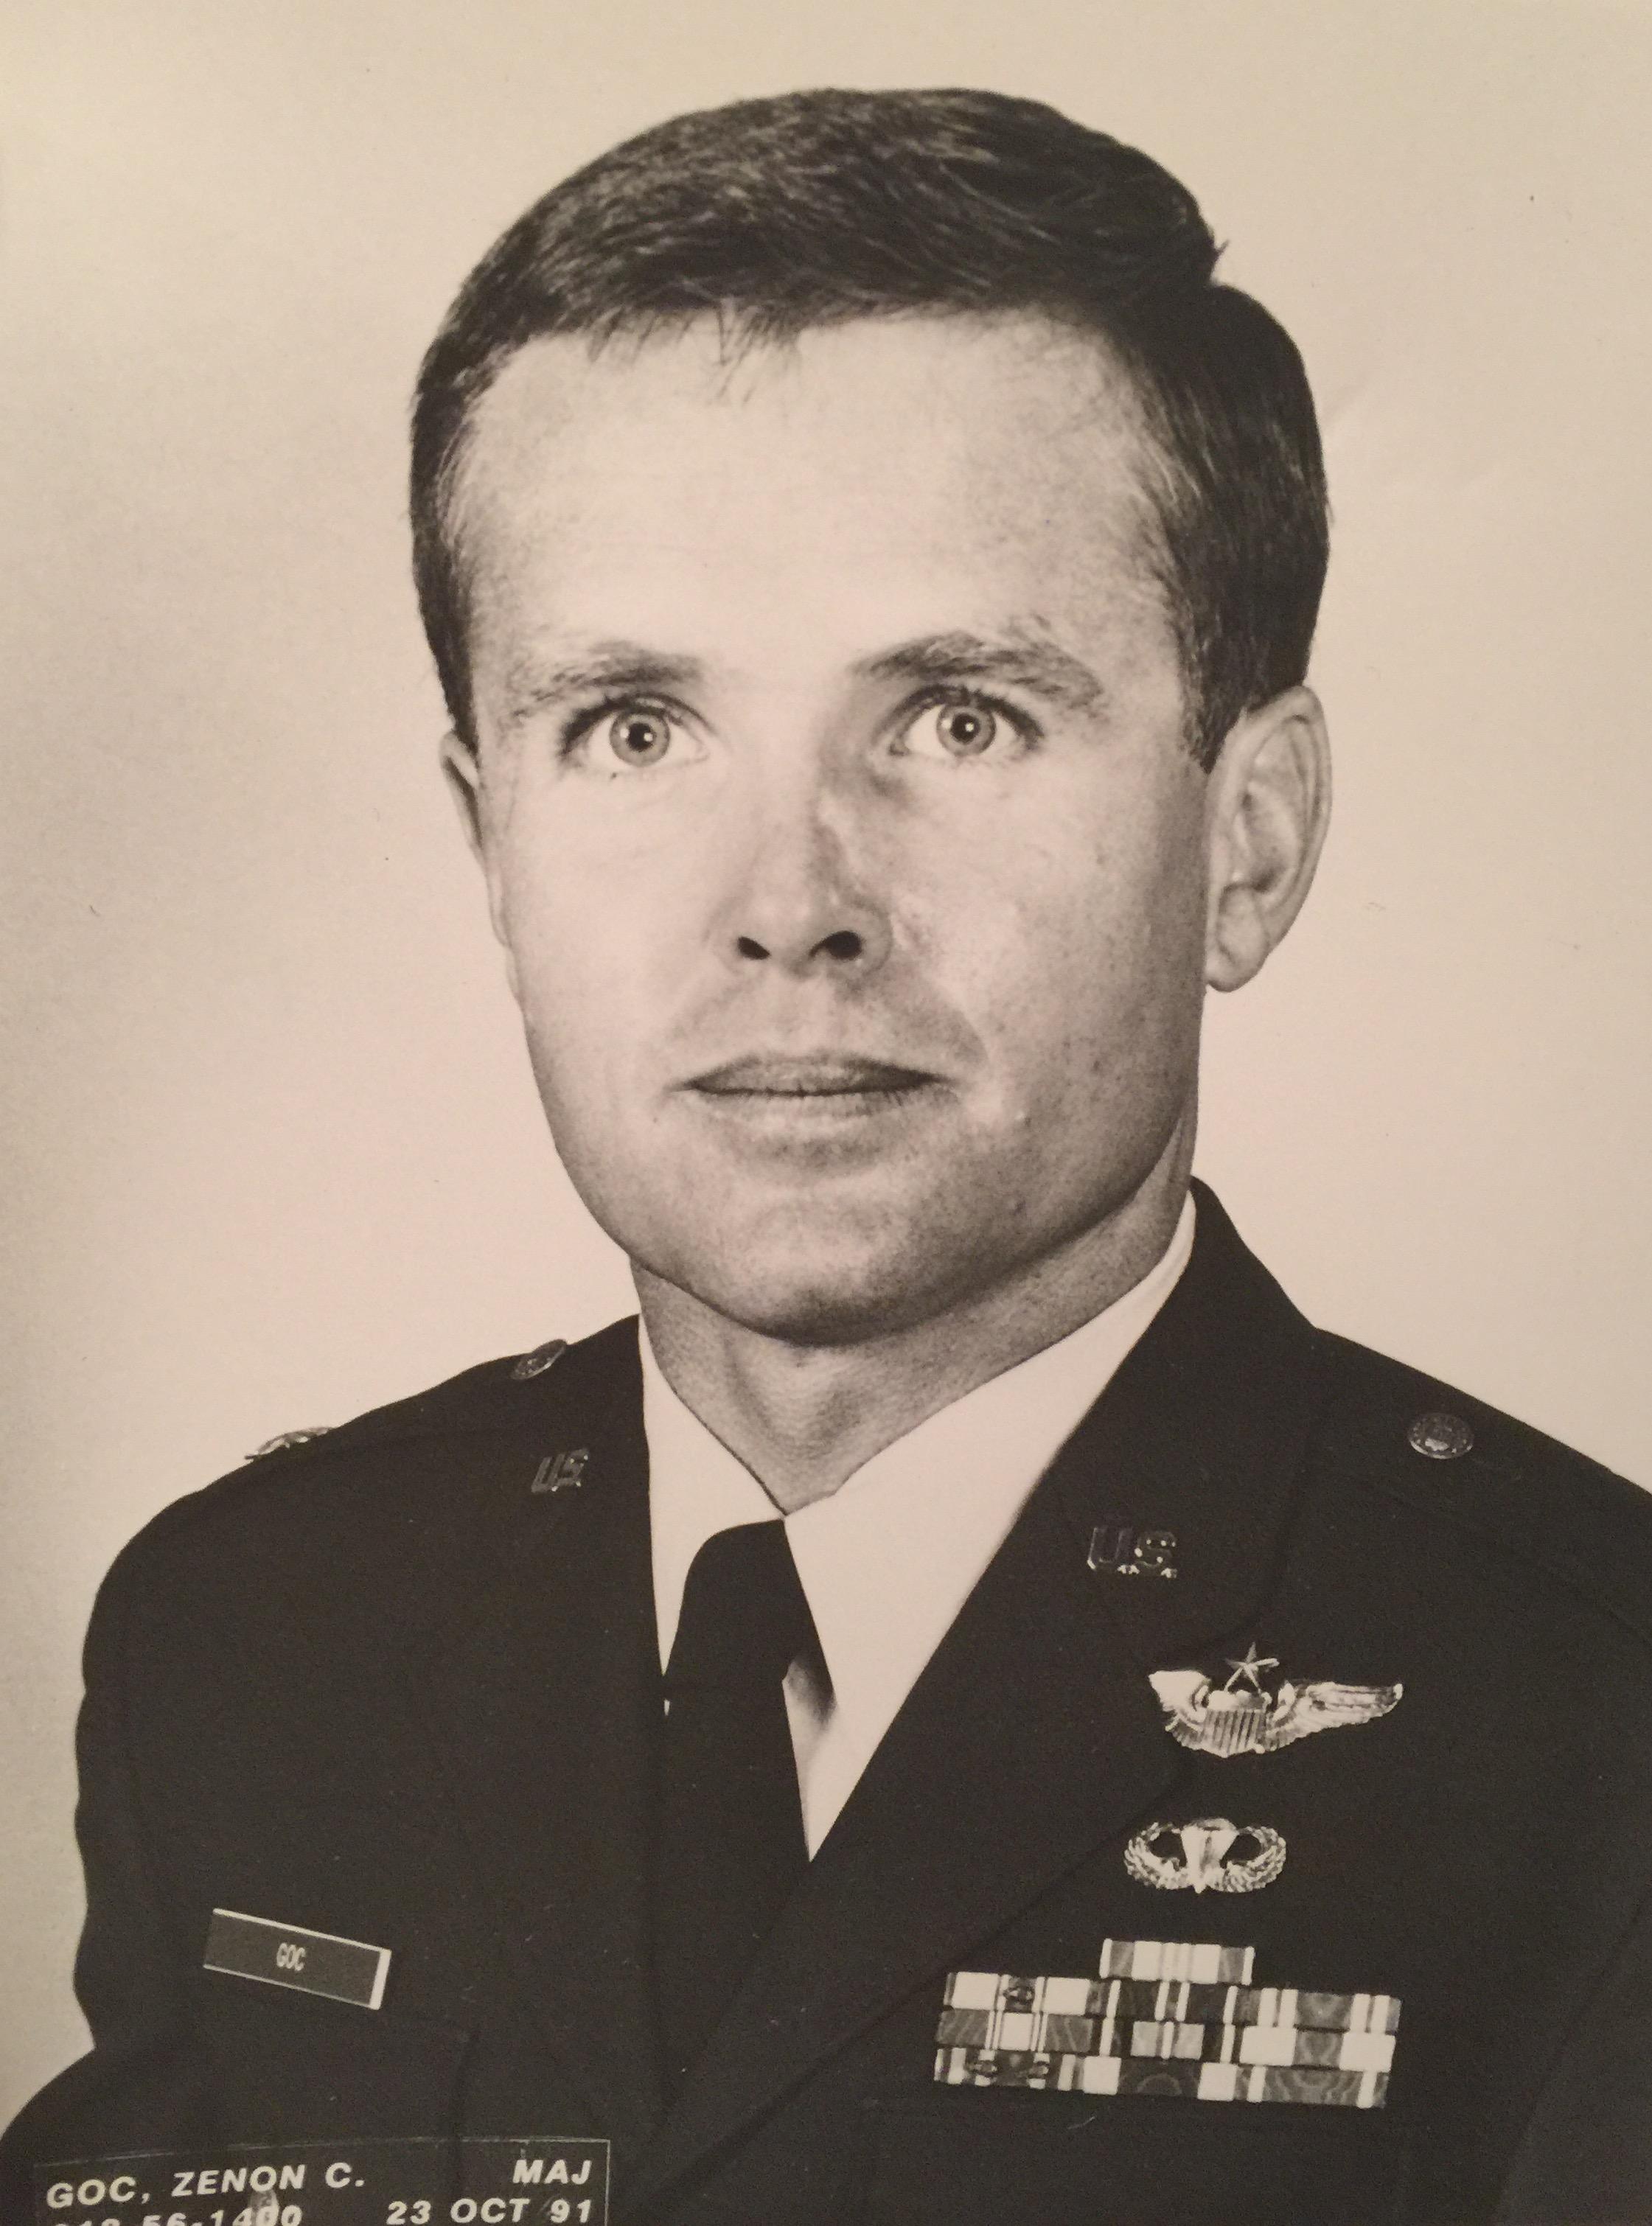 Air Force Maj. Zenon Goc, who was killed in a B-1 Bomber crash in 1992. (Children of Fallen Patriots Foundation)